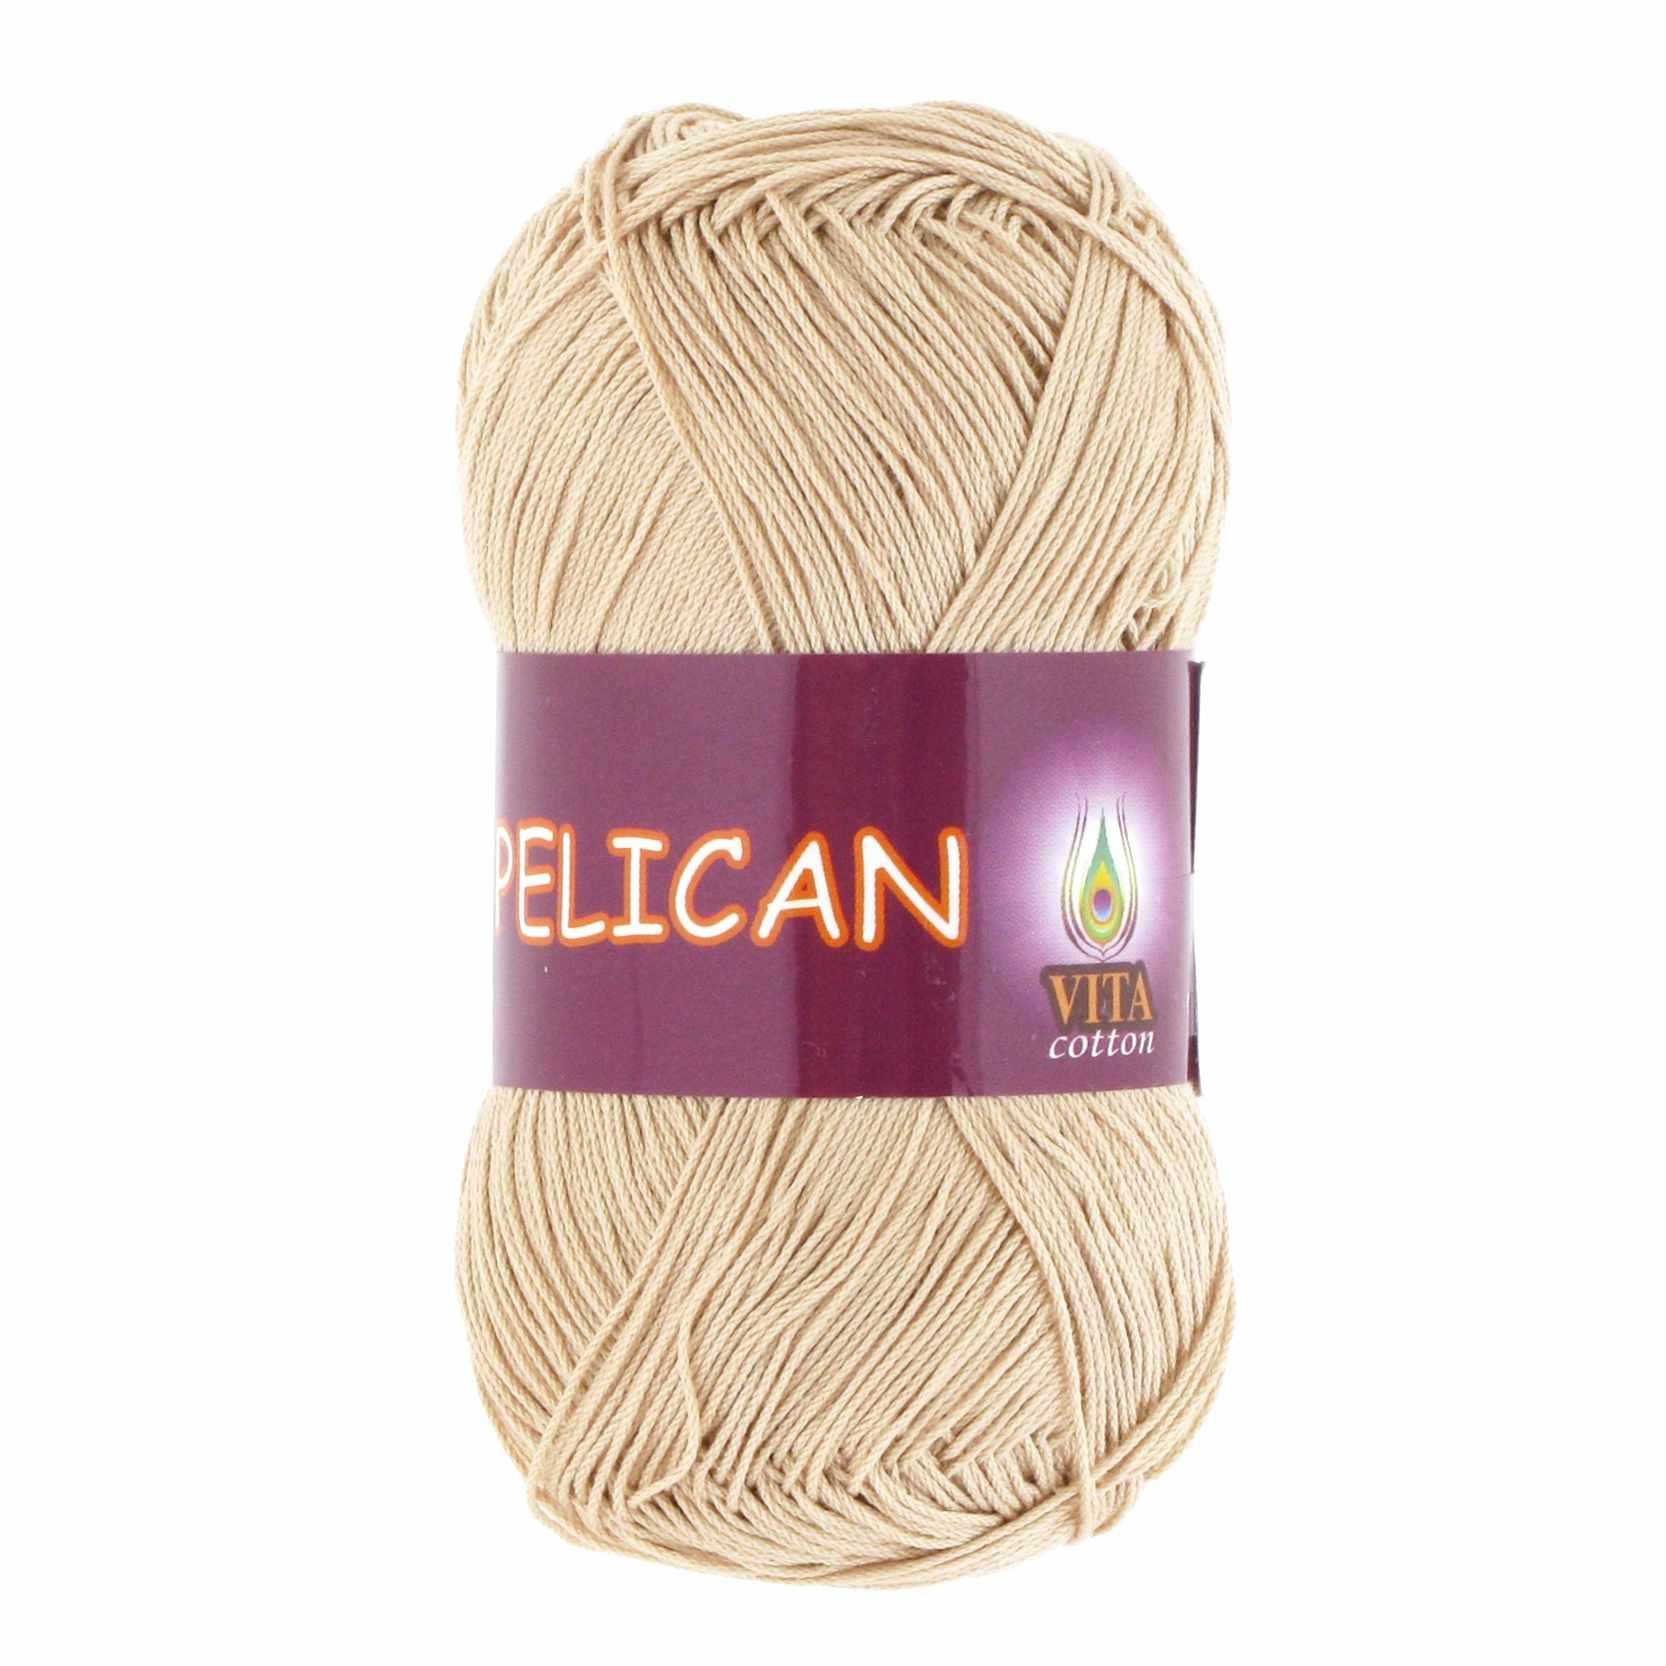 Пряжа VITA Pelican Цвет.3976 Светло-бежевый